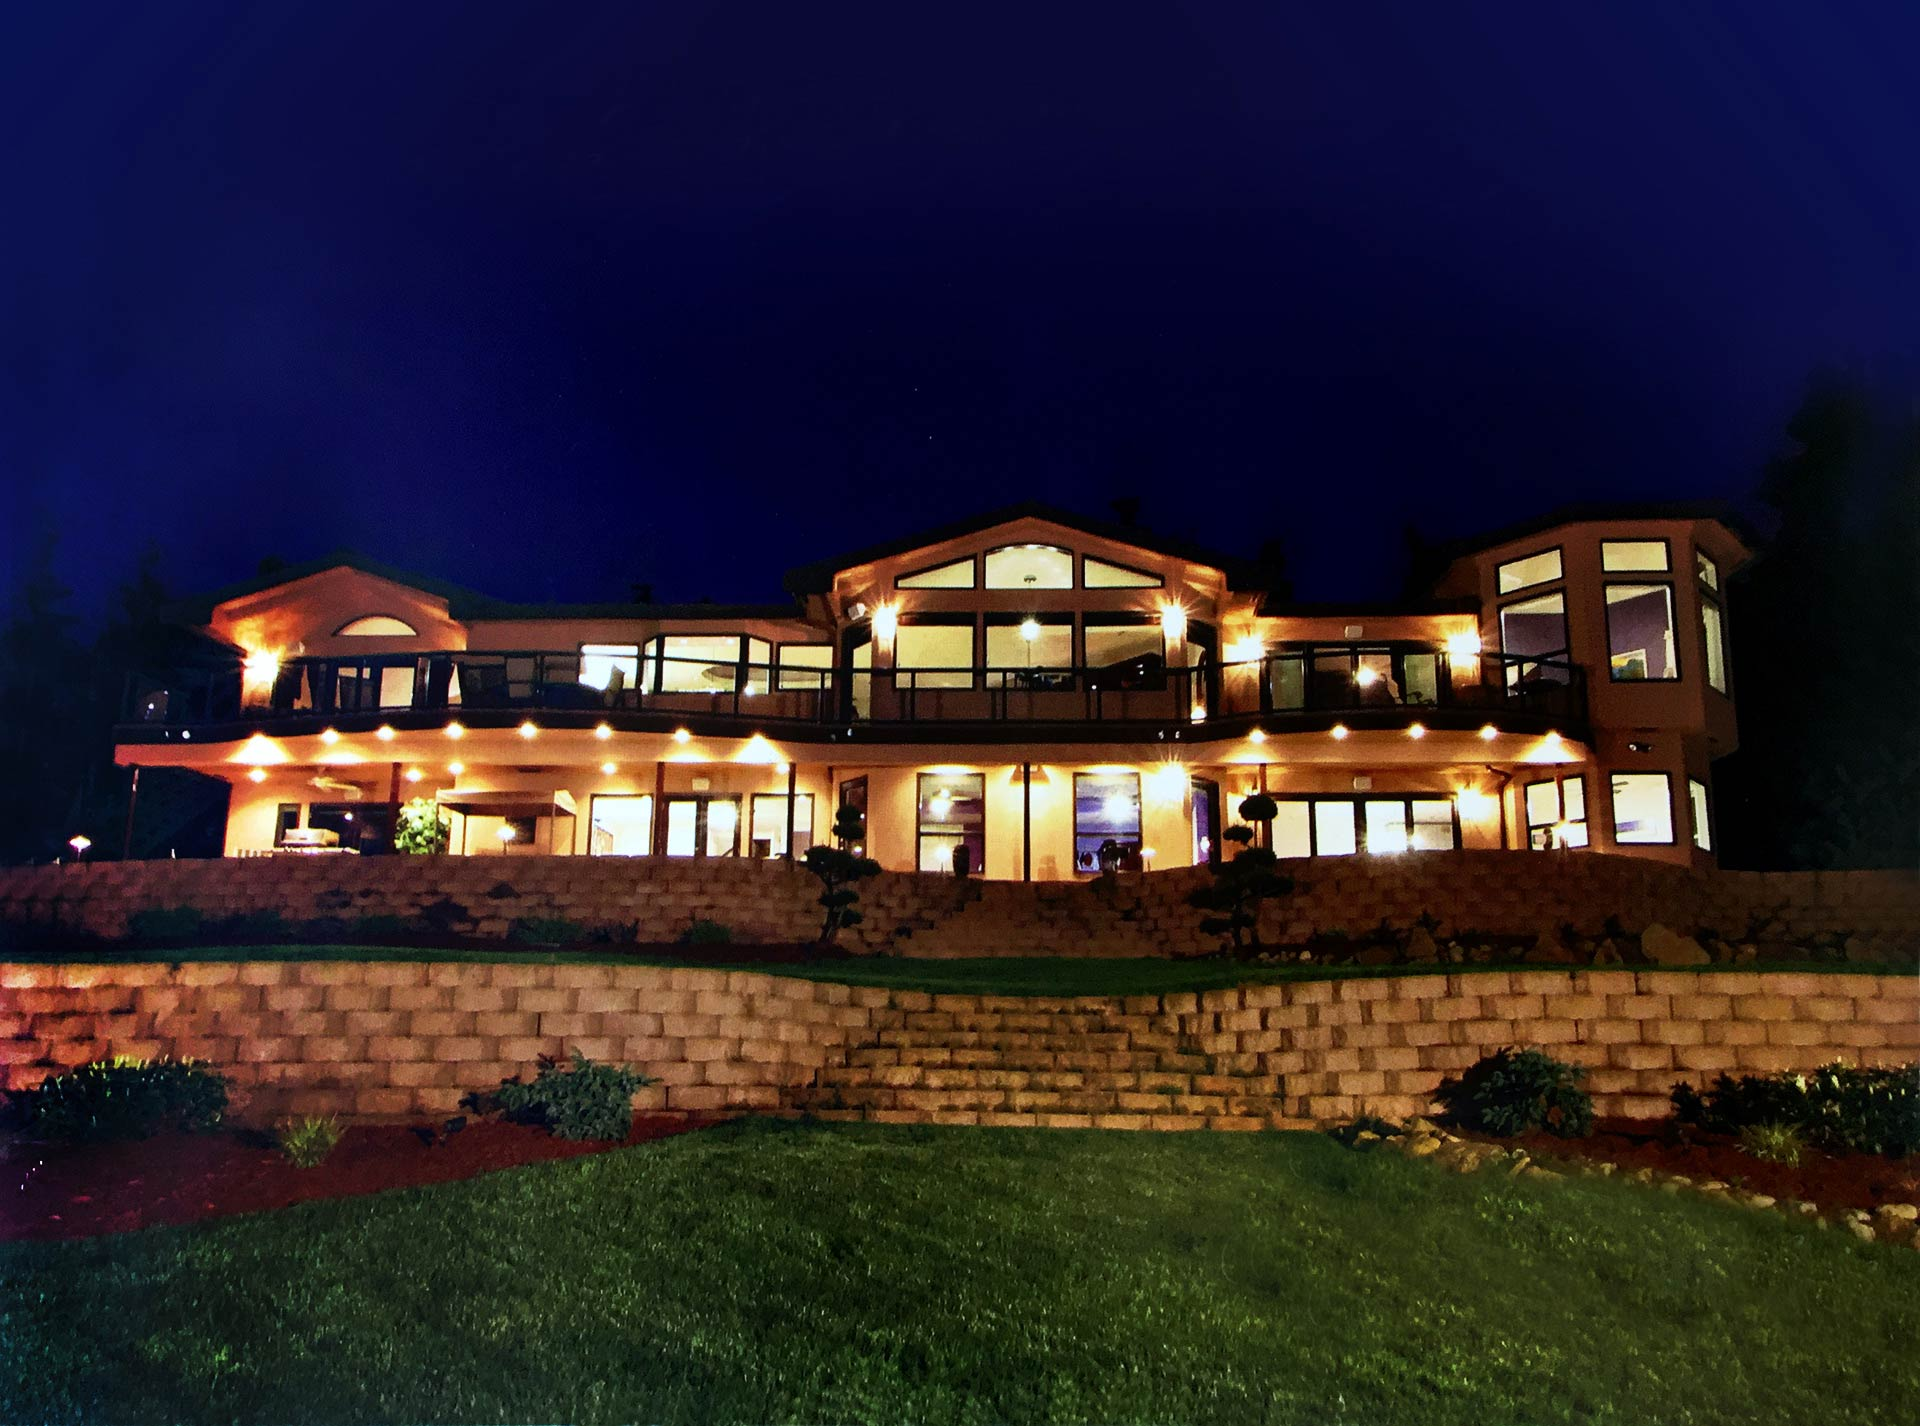 Custom Built Home in Eastern Washington